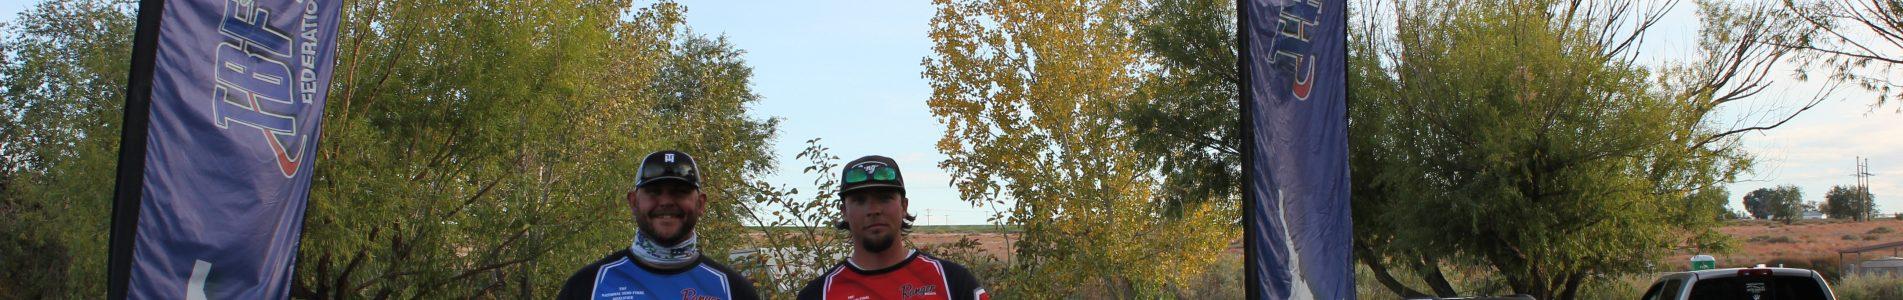 Idaho Top Boater Top Co Angler